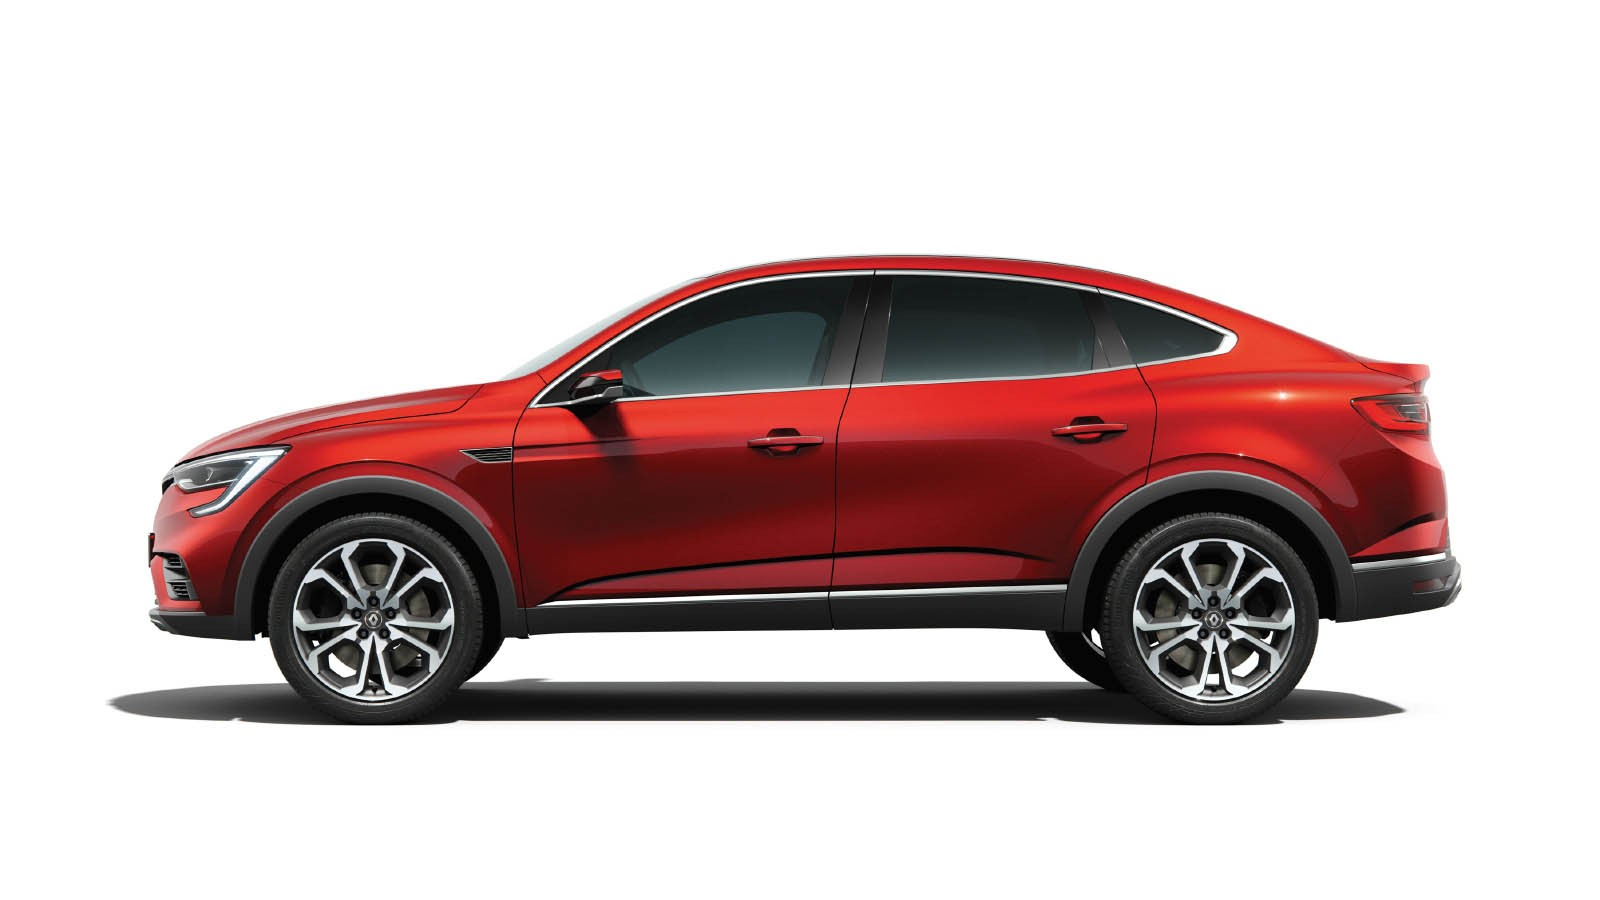 Renault Arkana '2018